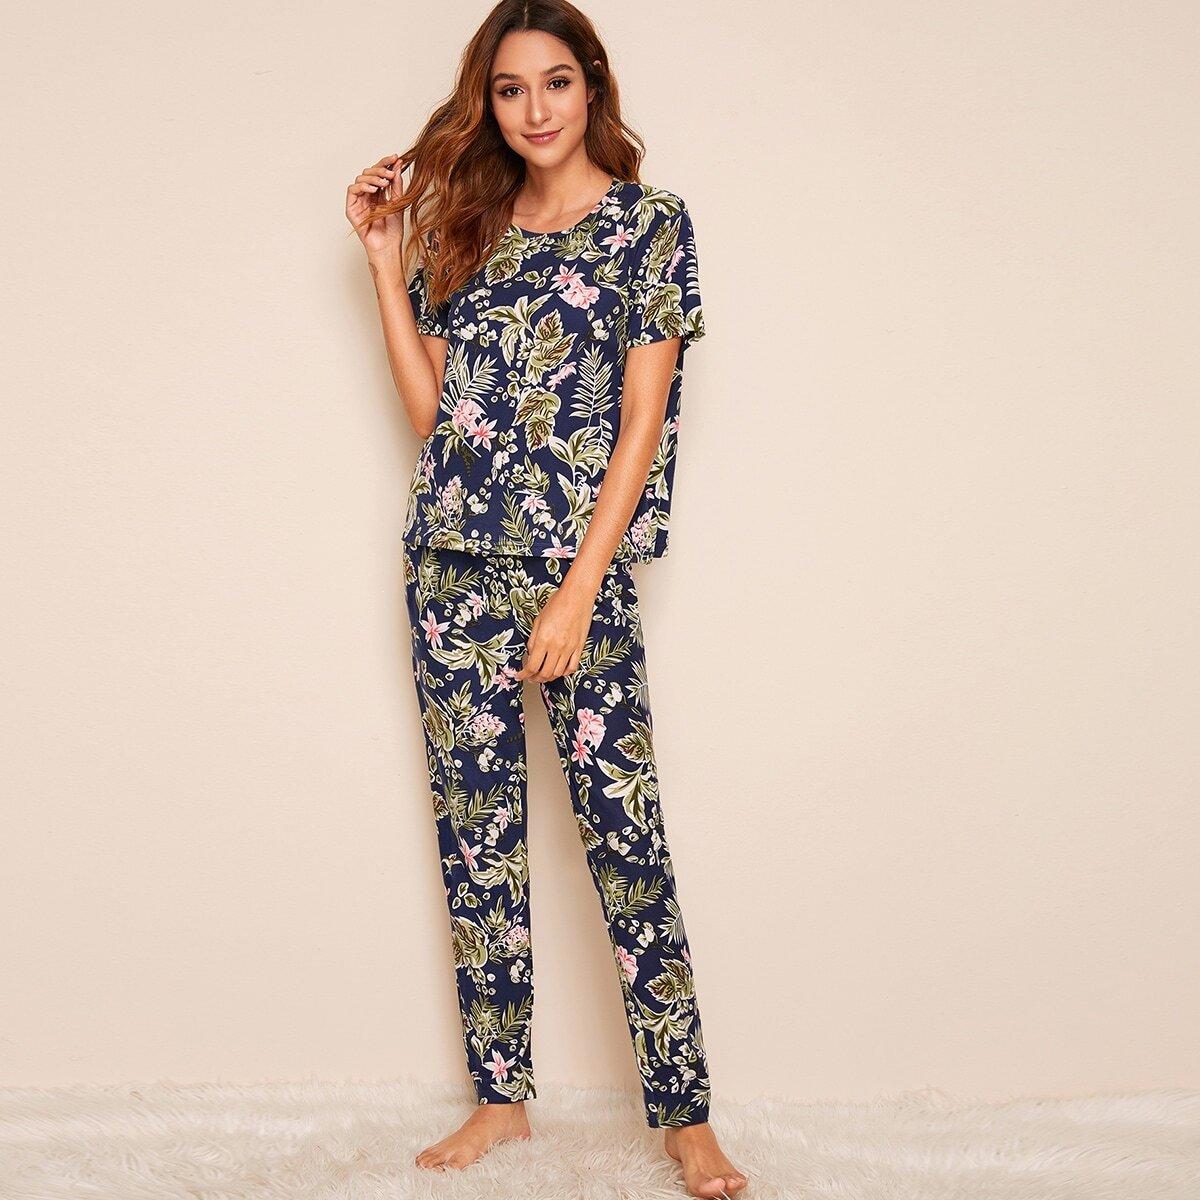 Veel kleurig Casual Bloemen Lounge kleding